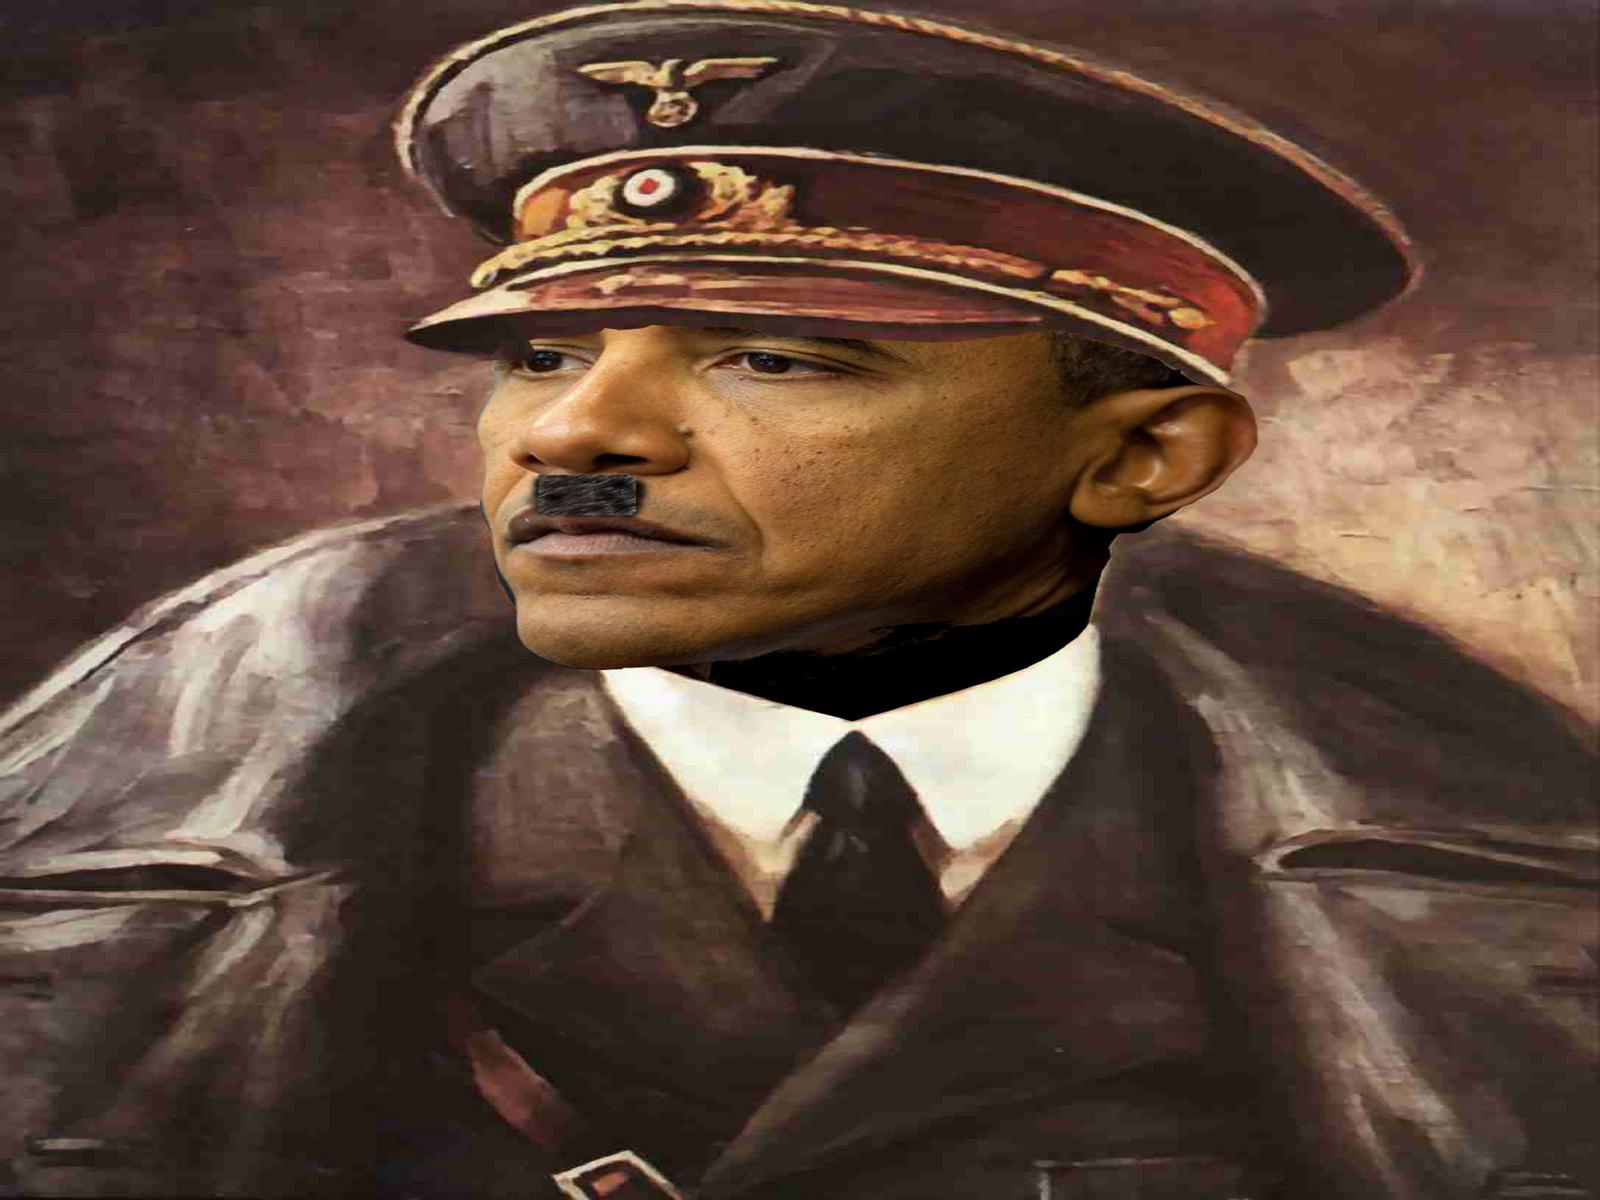 Nazi Hitler Barack Obama by myjavier007